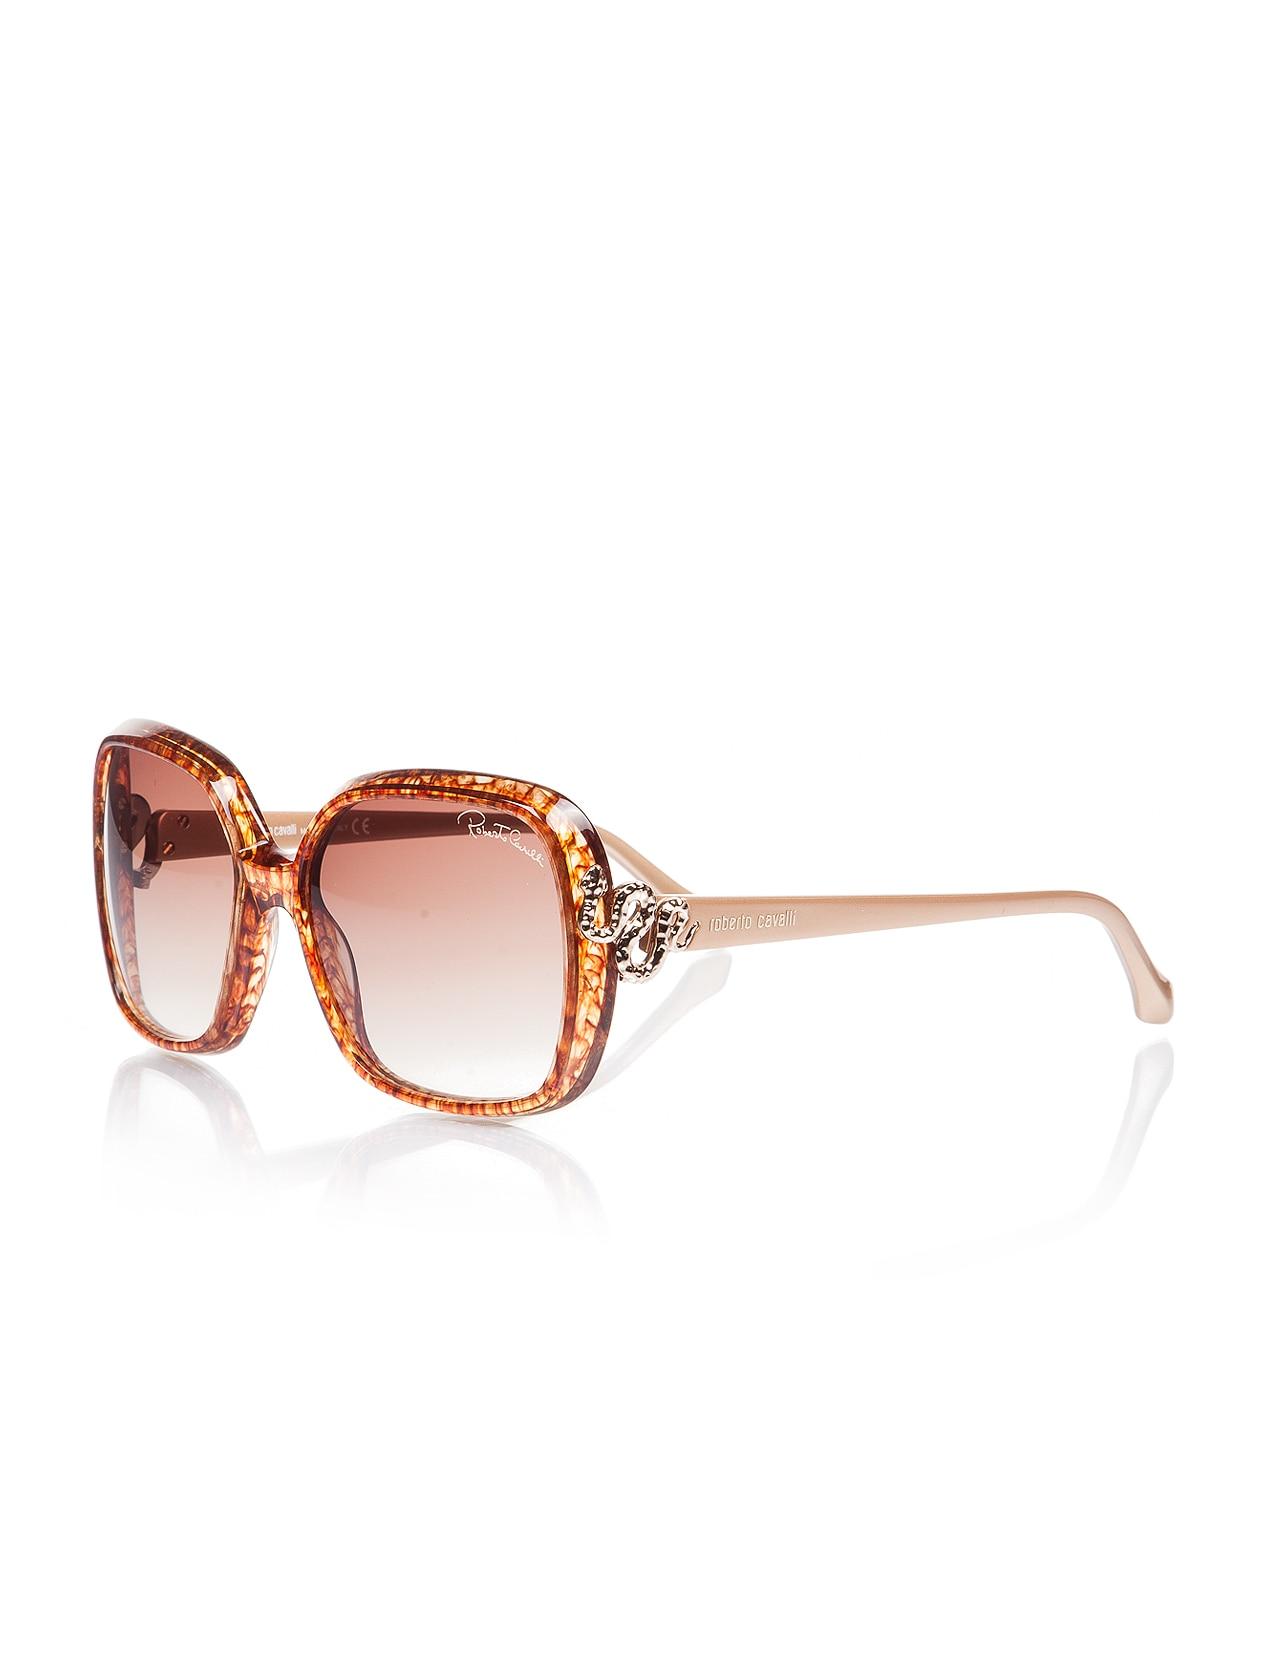 Women's sunglasses rc 1016 50f bone Brown organic 58-roberto cavalli